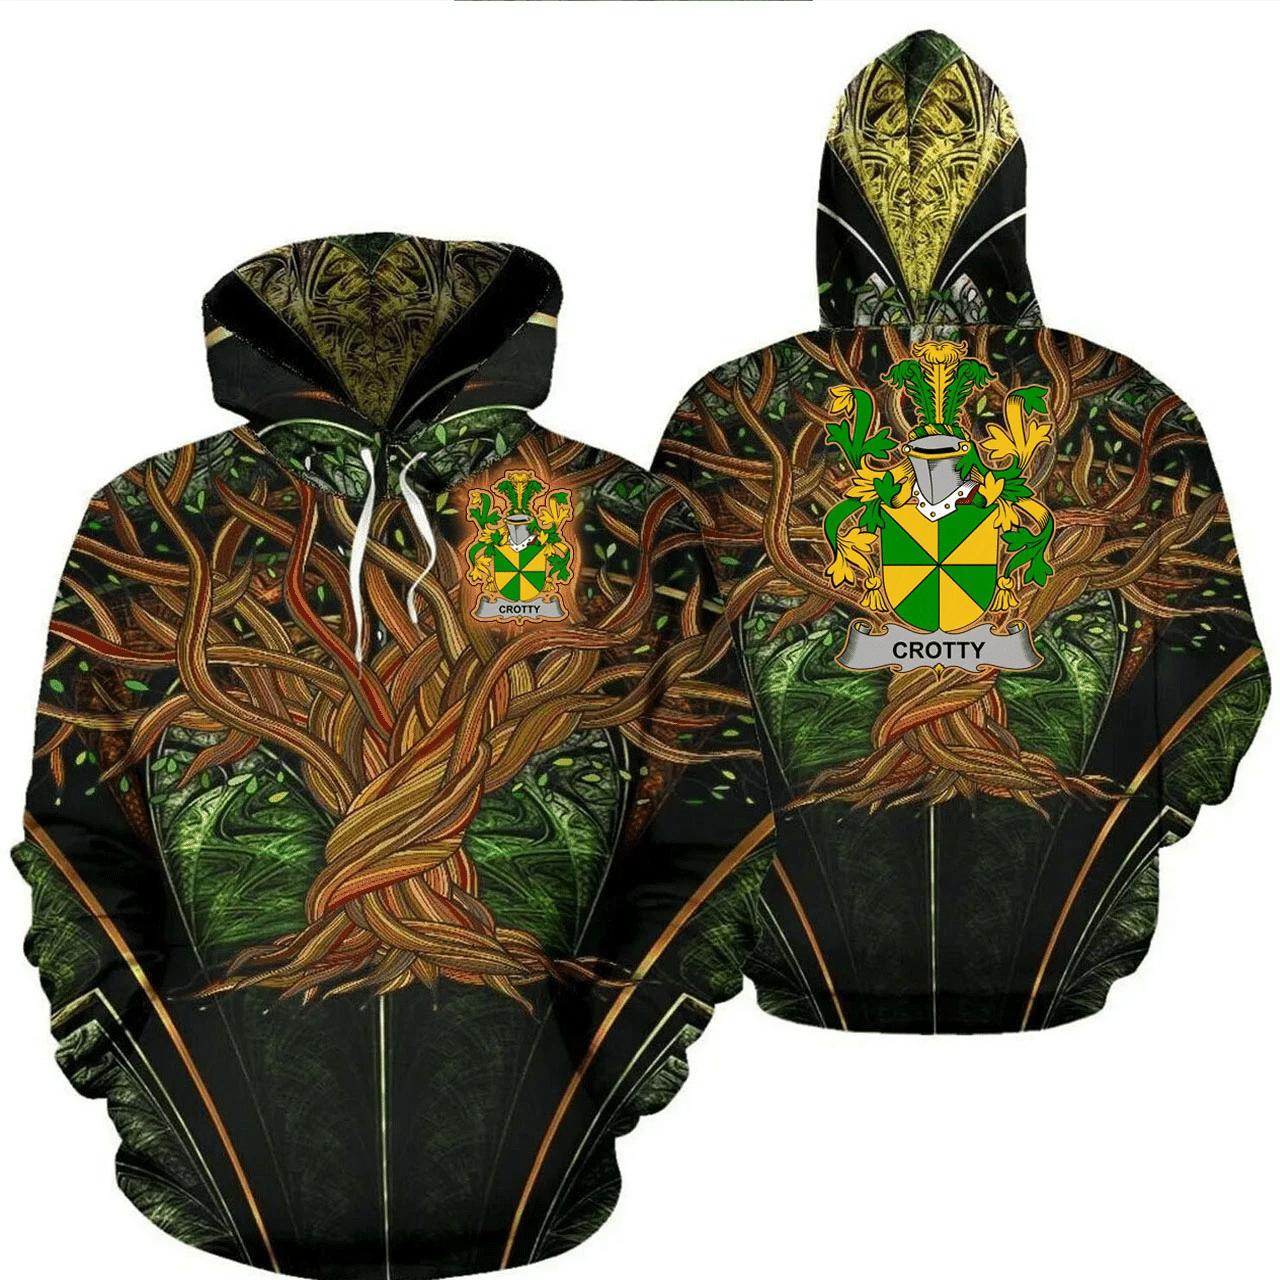 1stIreland Ireland Hoodie - Crotty or O'Crotty Irish Family Crest Hoodie - Tree Of Life A7